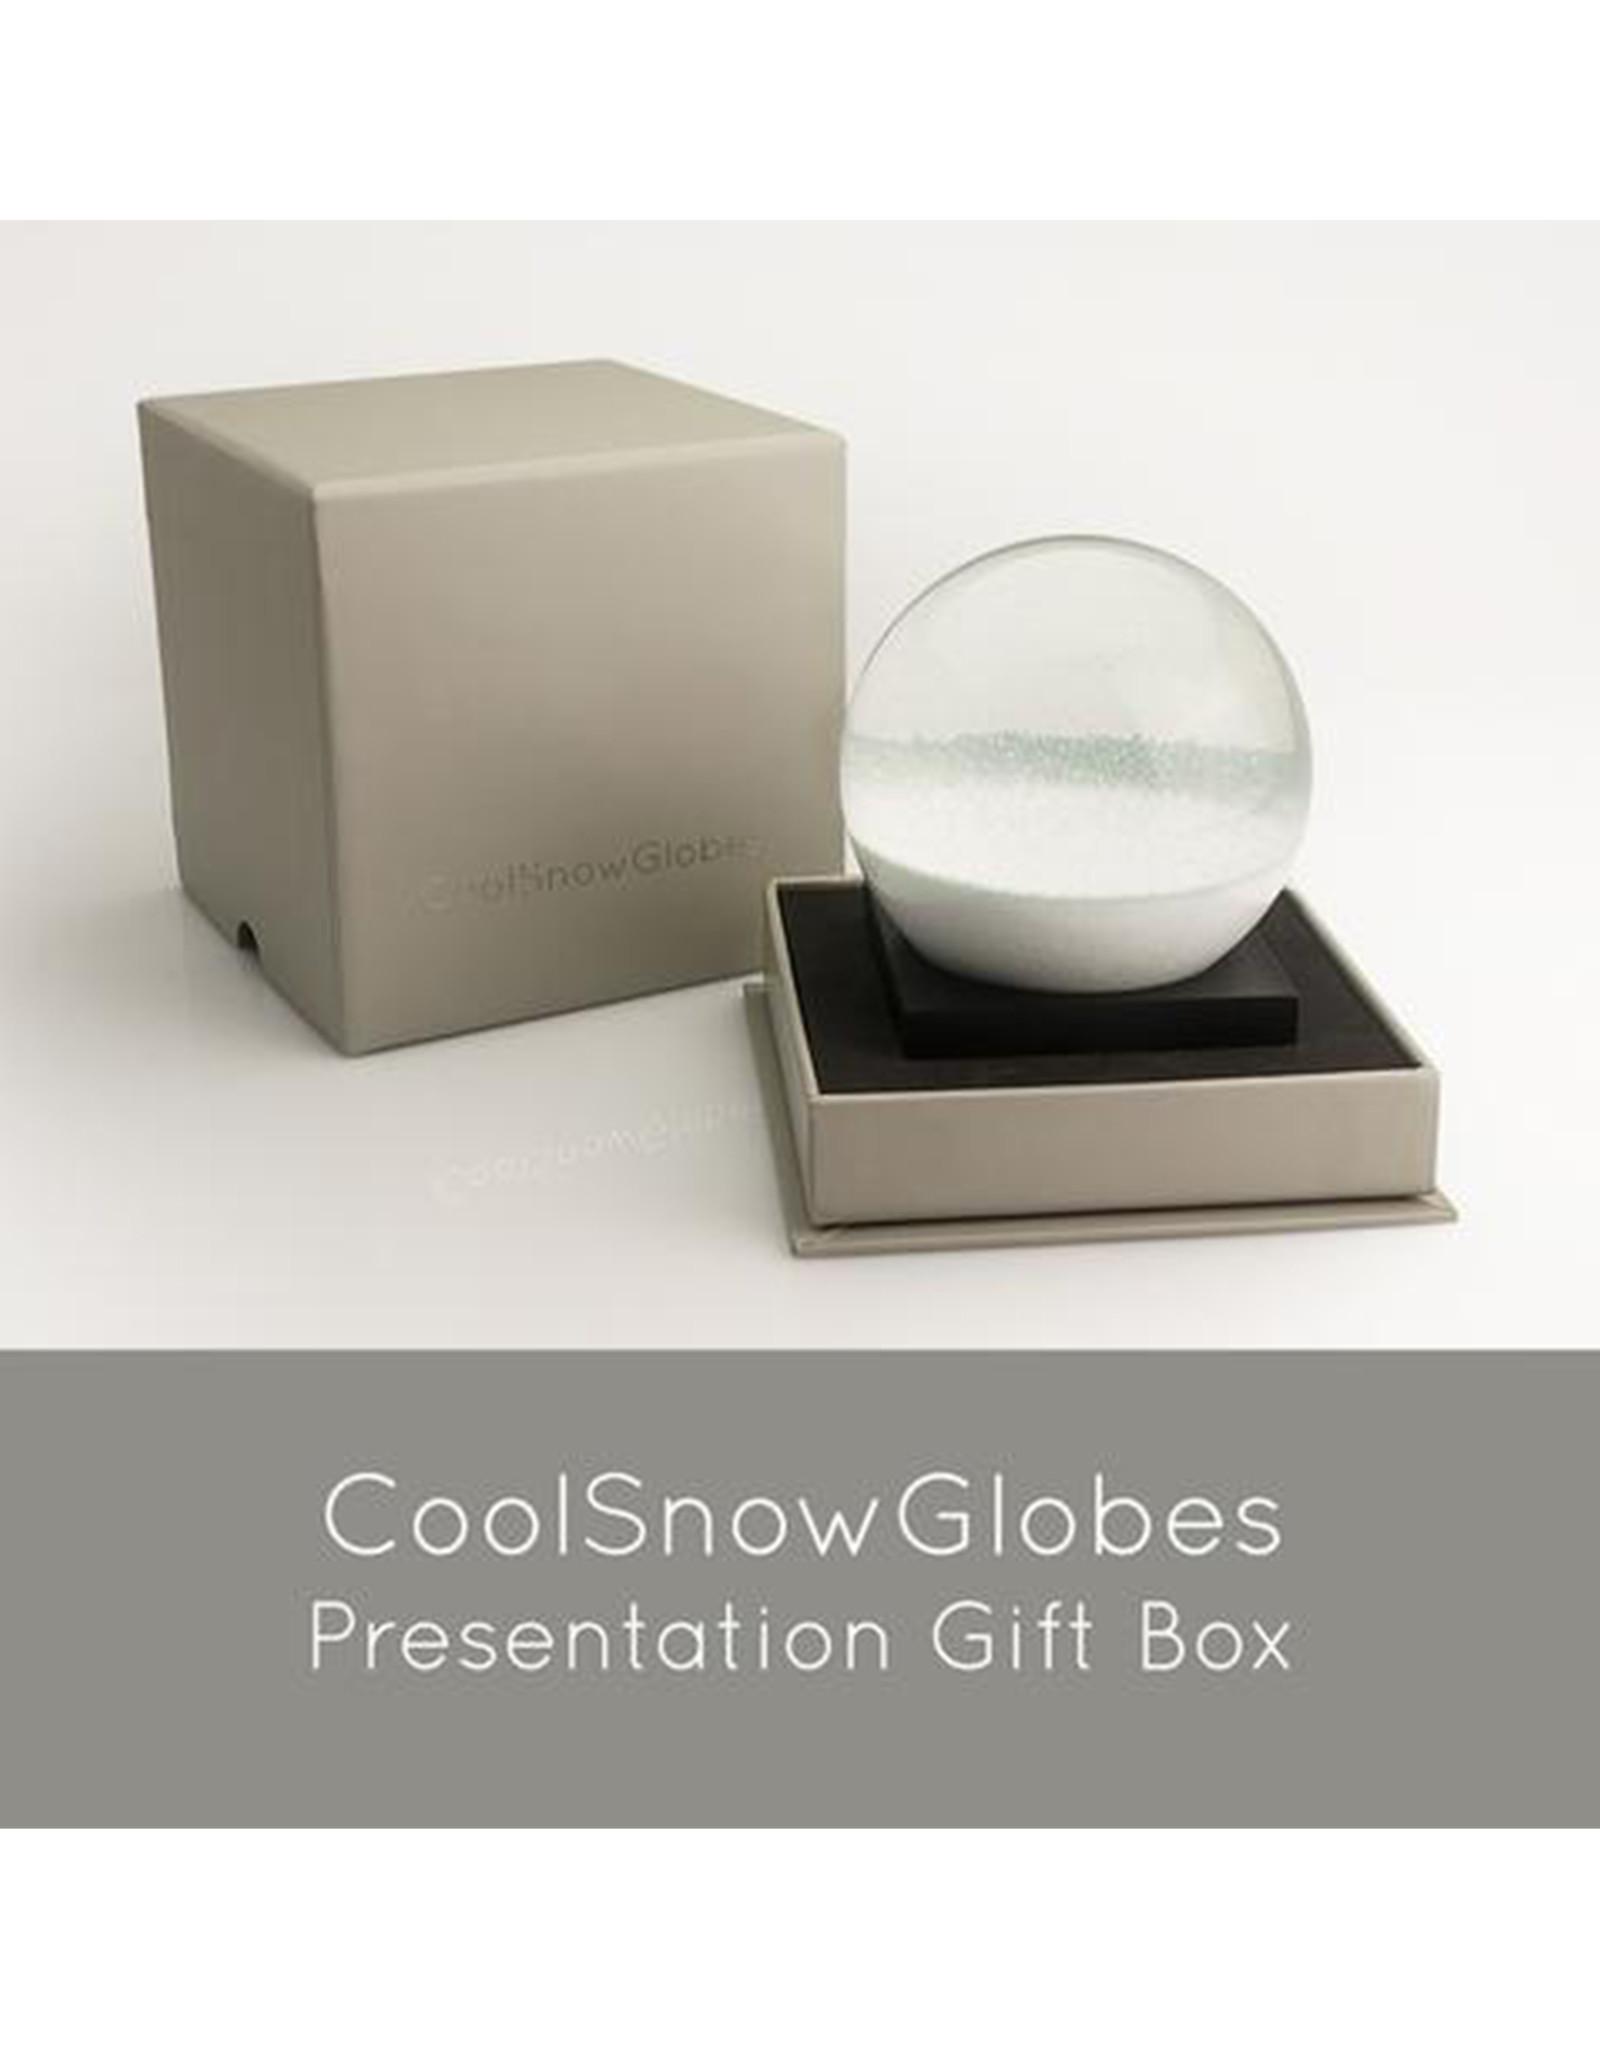 COOL SNOW GLOBES BABY BLOCKS SNOW GLOBE